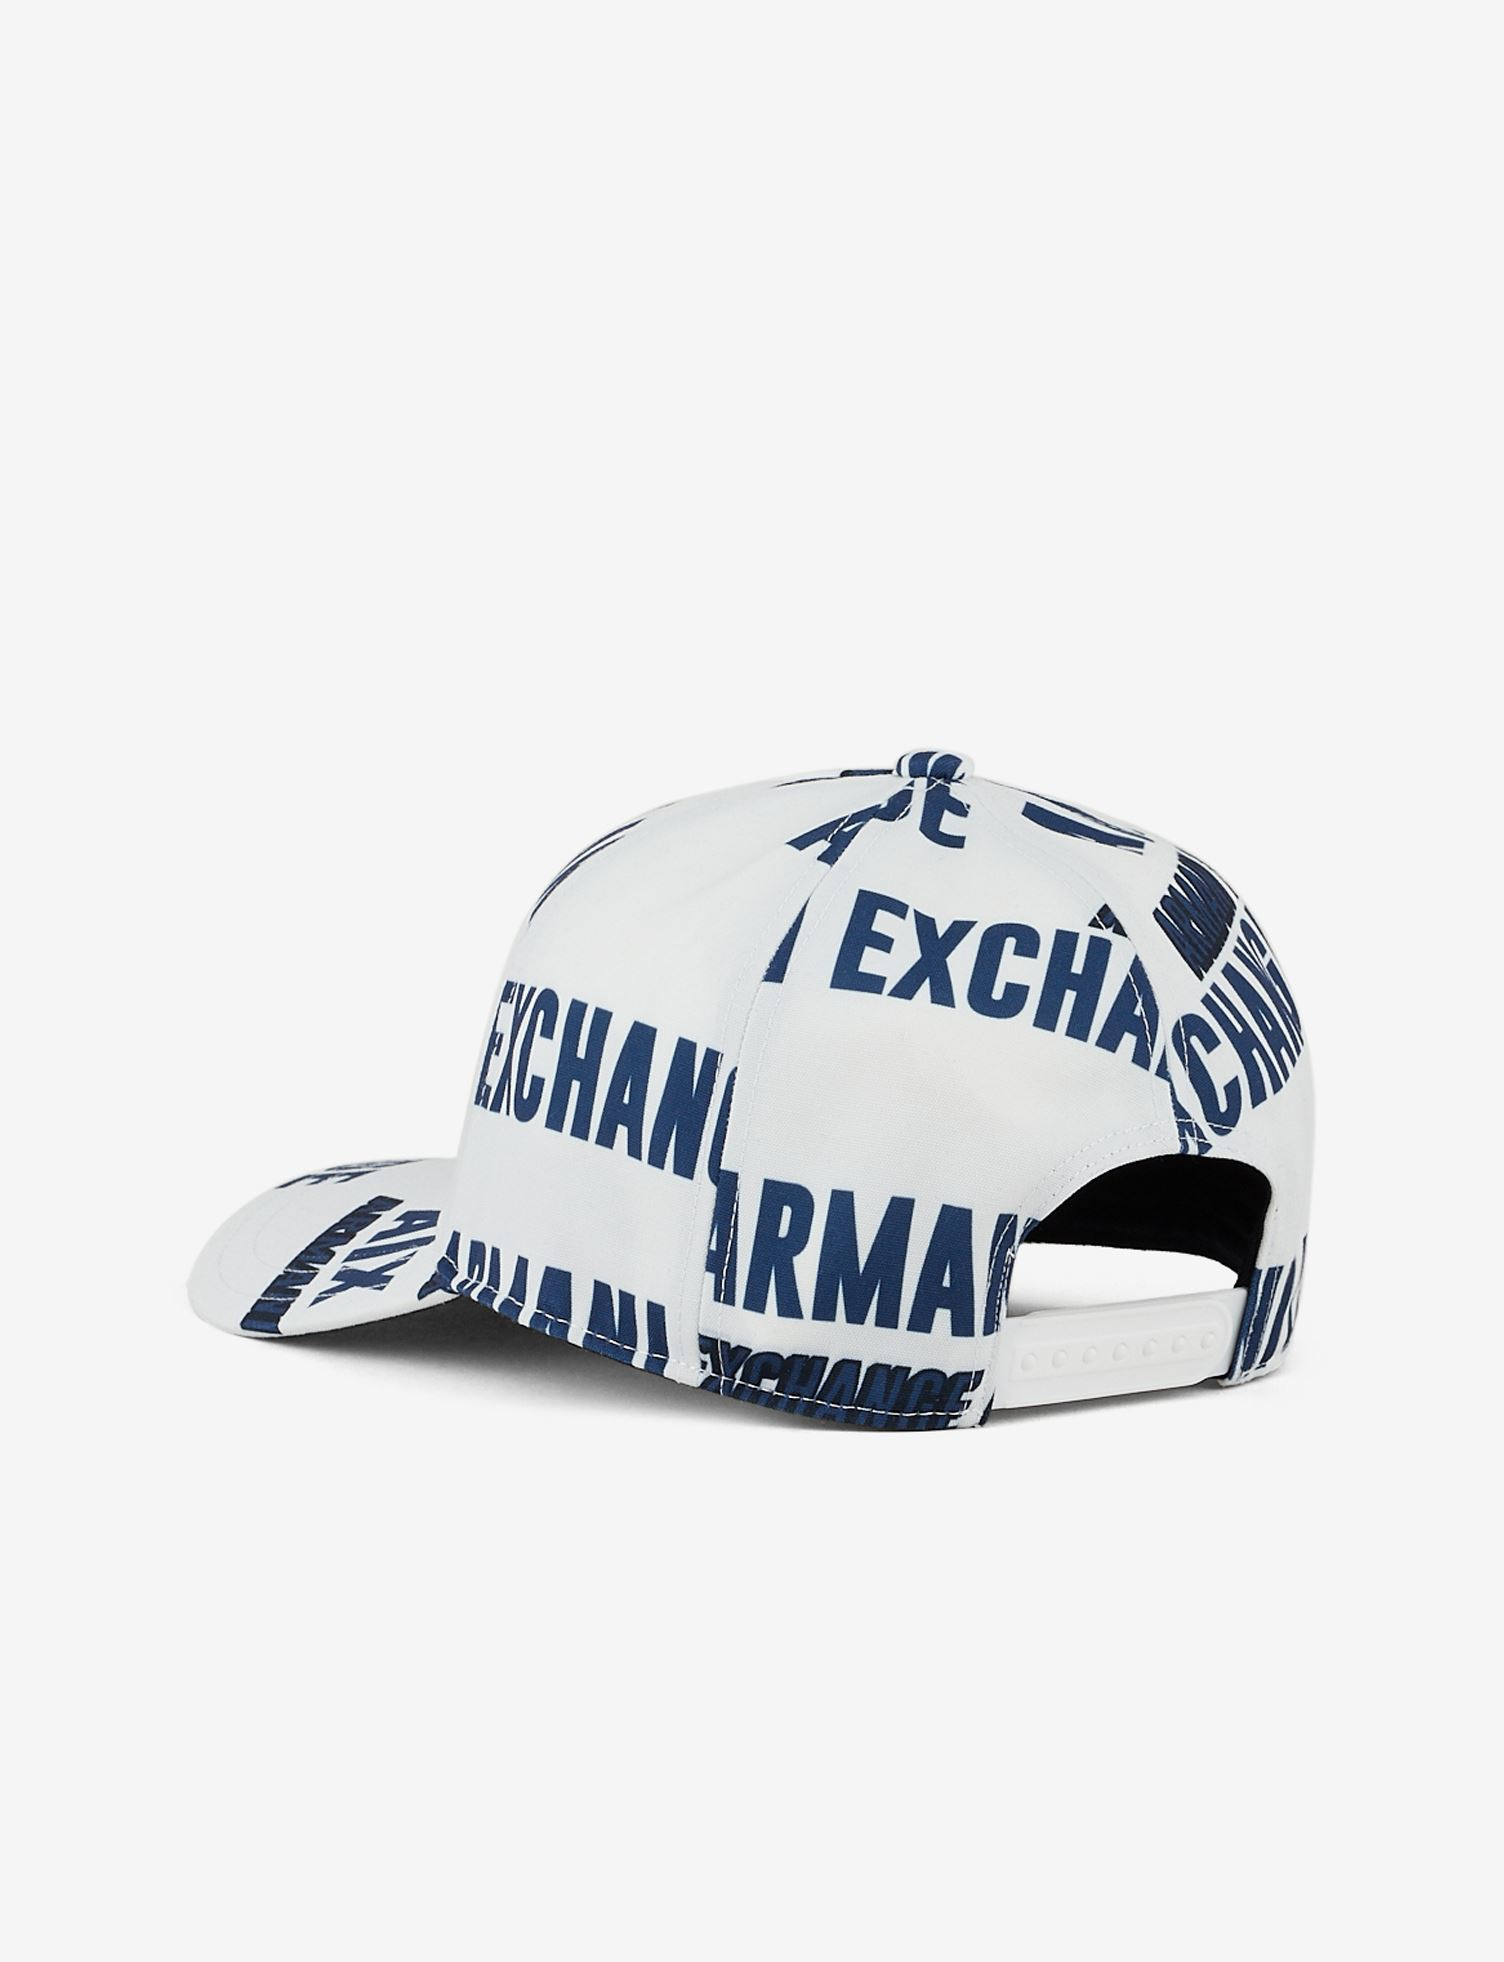 Cappello con visiera Armani Exchange ARMANI EXCHANGE | Cappello | 954202-1P10173110